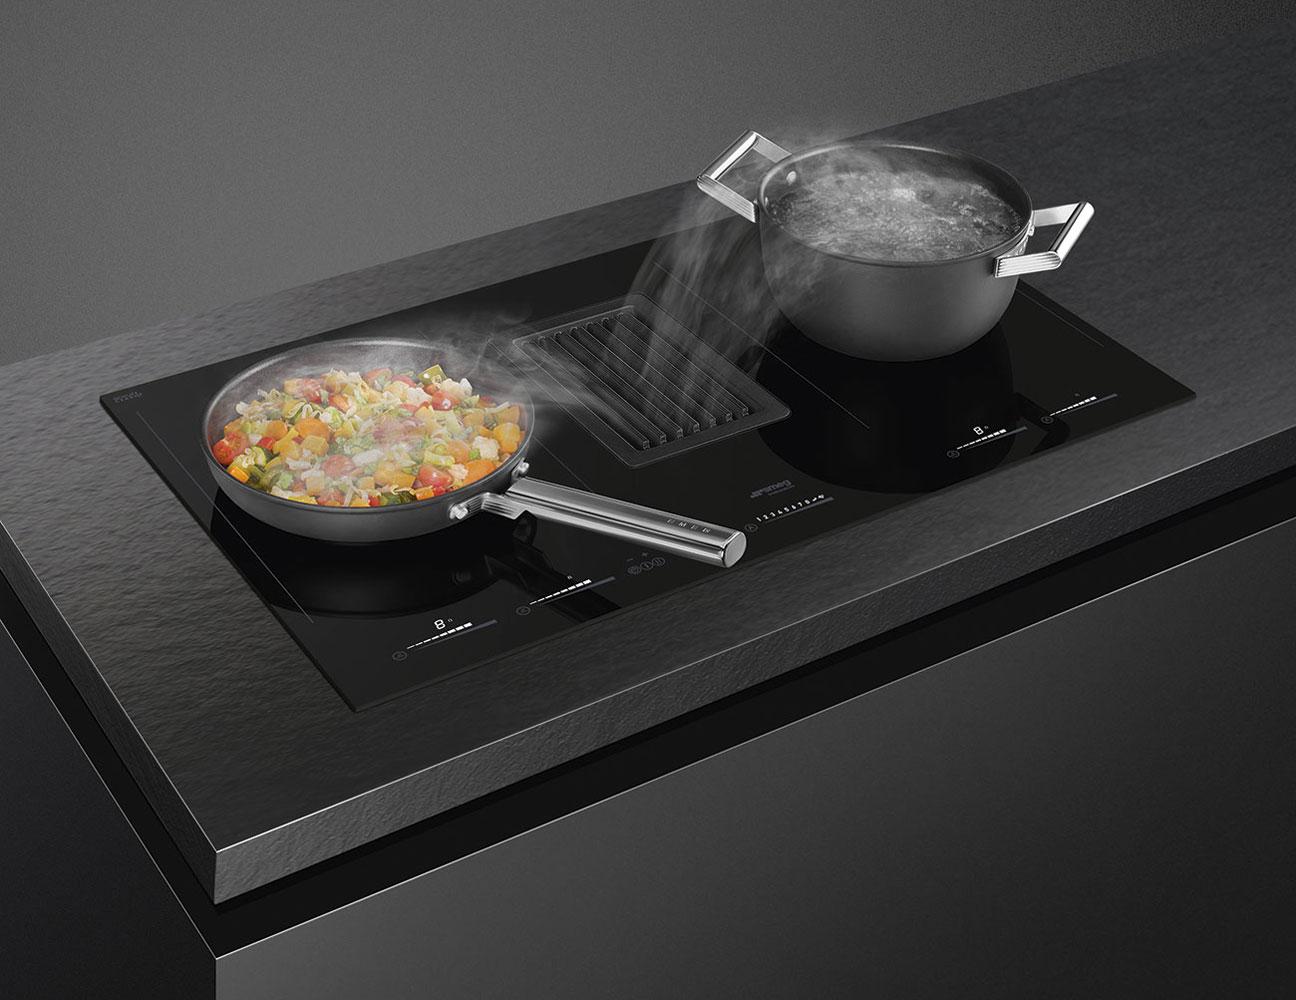 Plita inductie cu hota SMEG HOBD682D1 integrata sticla ceramica neagra 80 cm detalii aspiratie